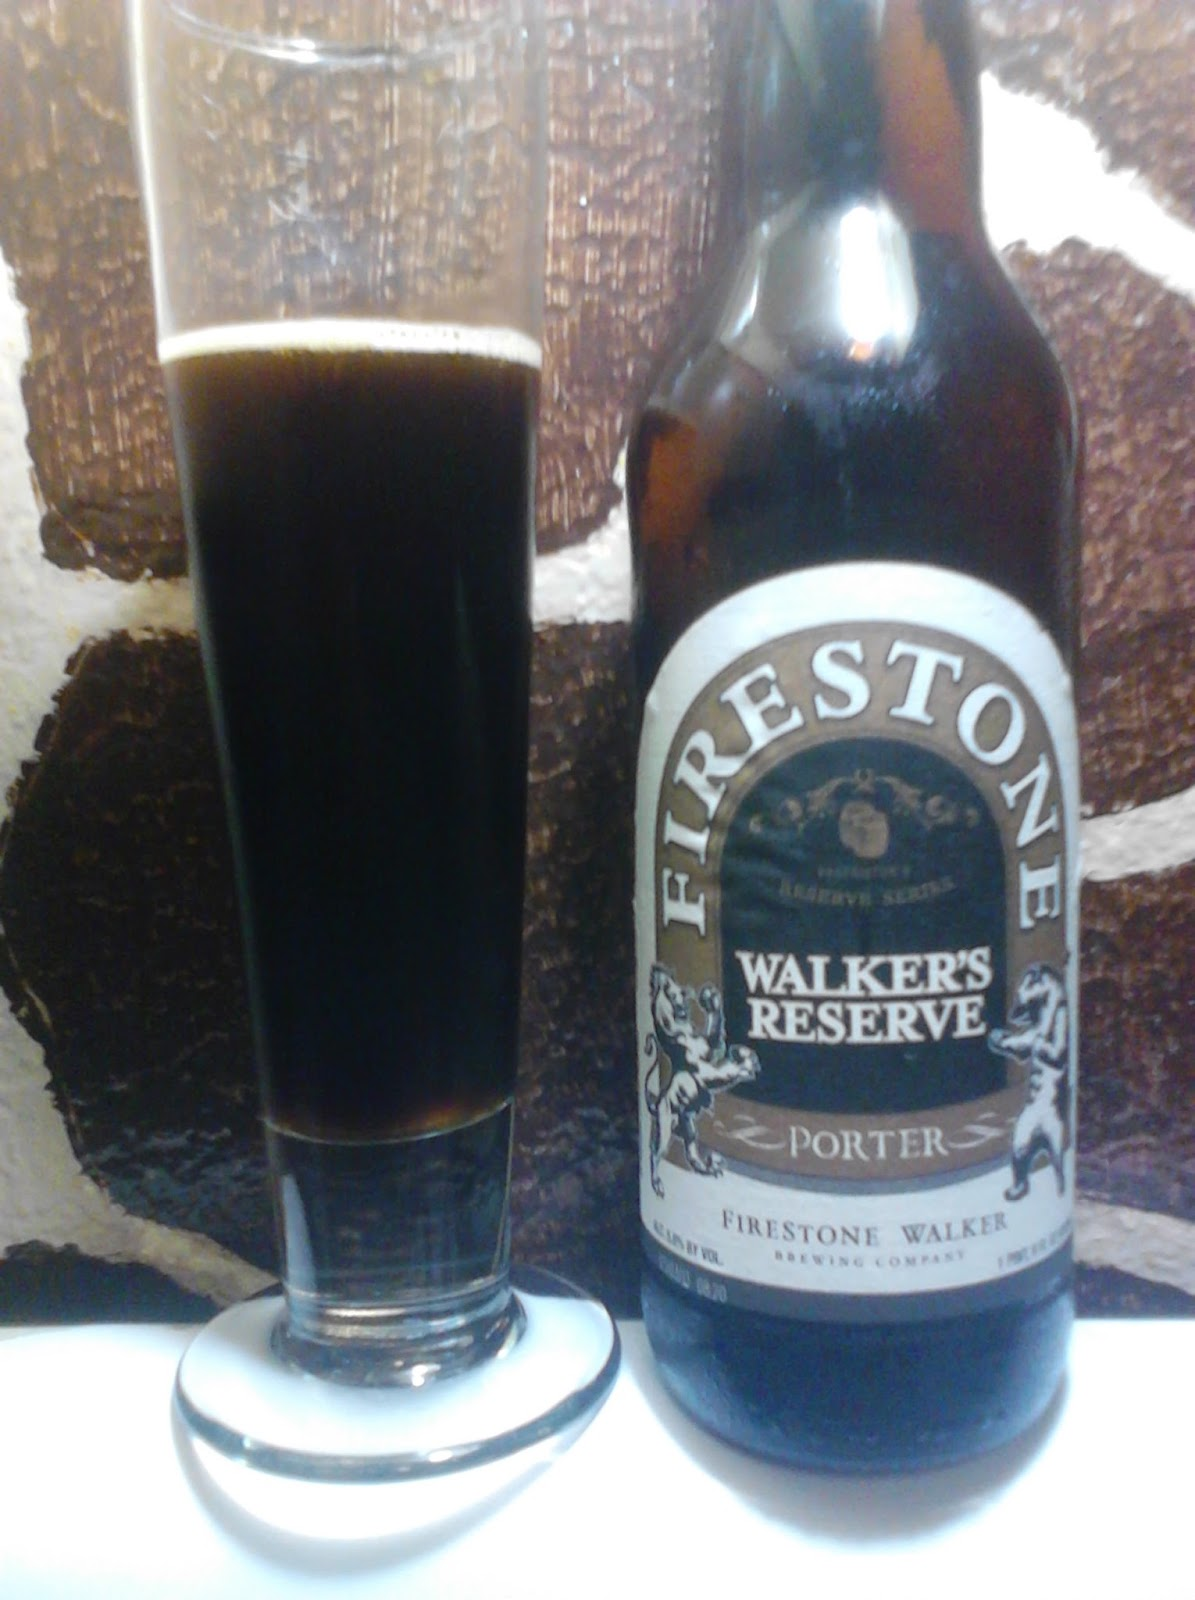 Firestone Walker's Reserve Porter pic